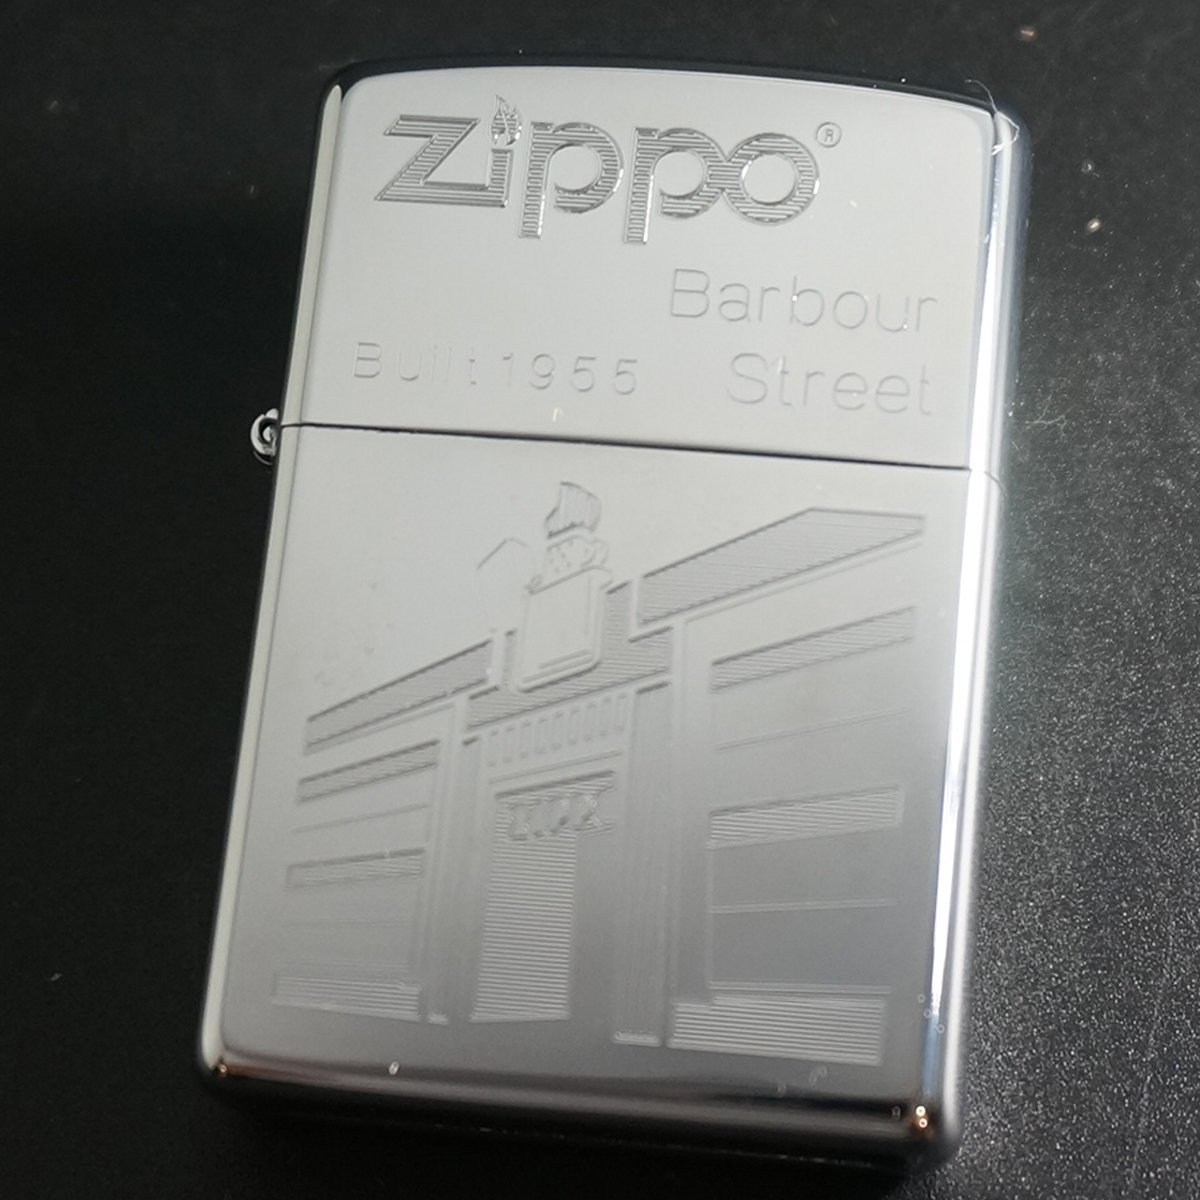 zippo ZIPPO社屋 50周年記念 ポスターセット 2005年製造 B073B4XFKM